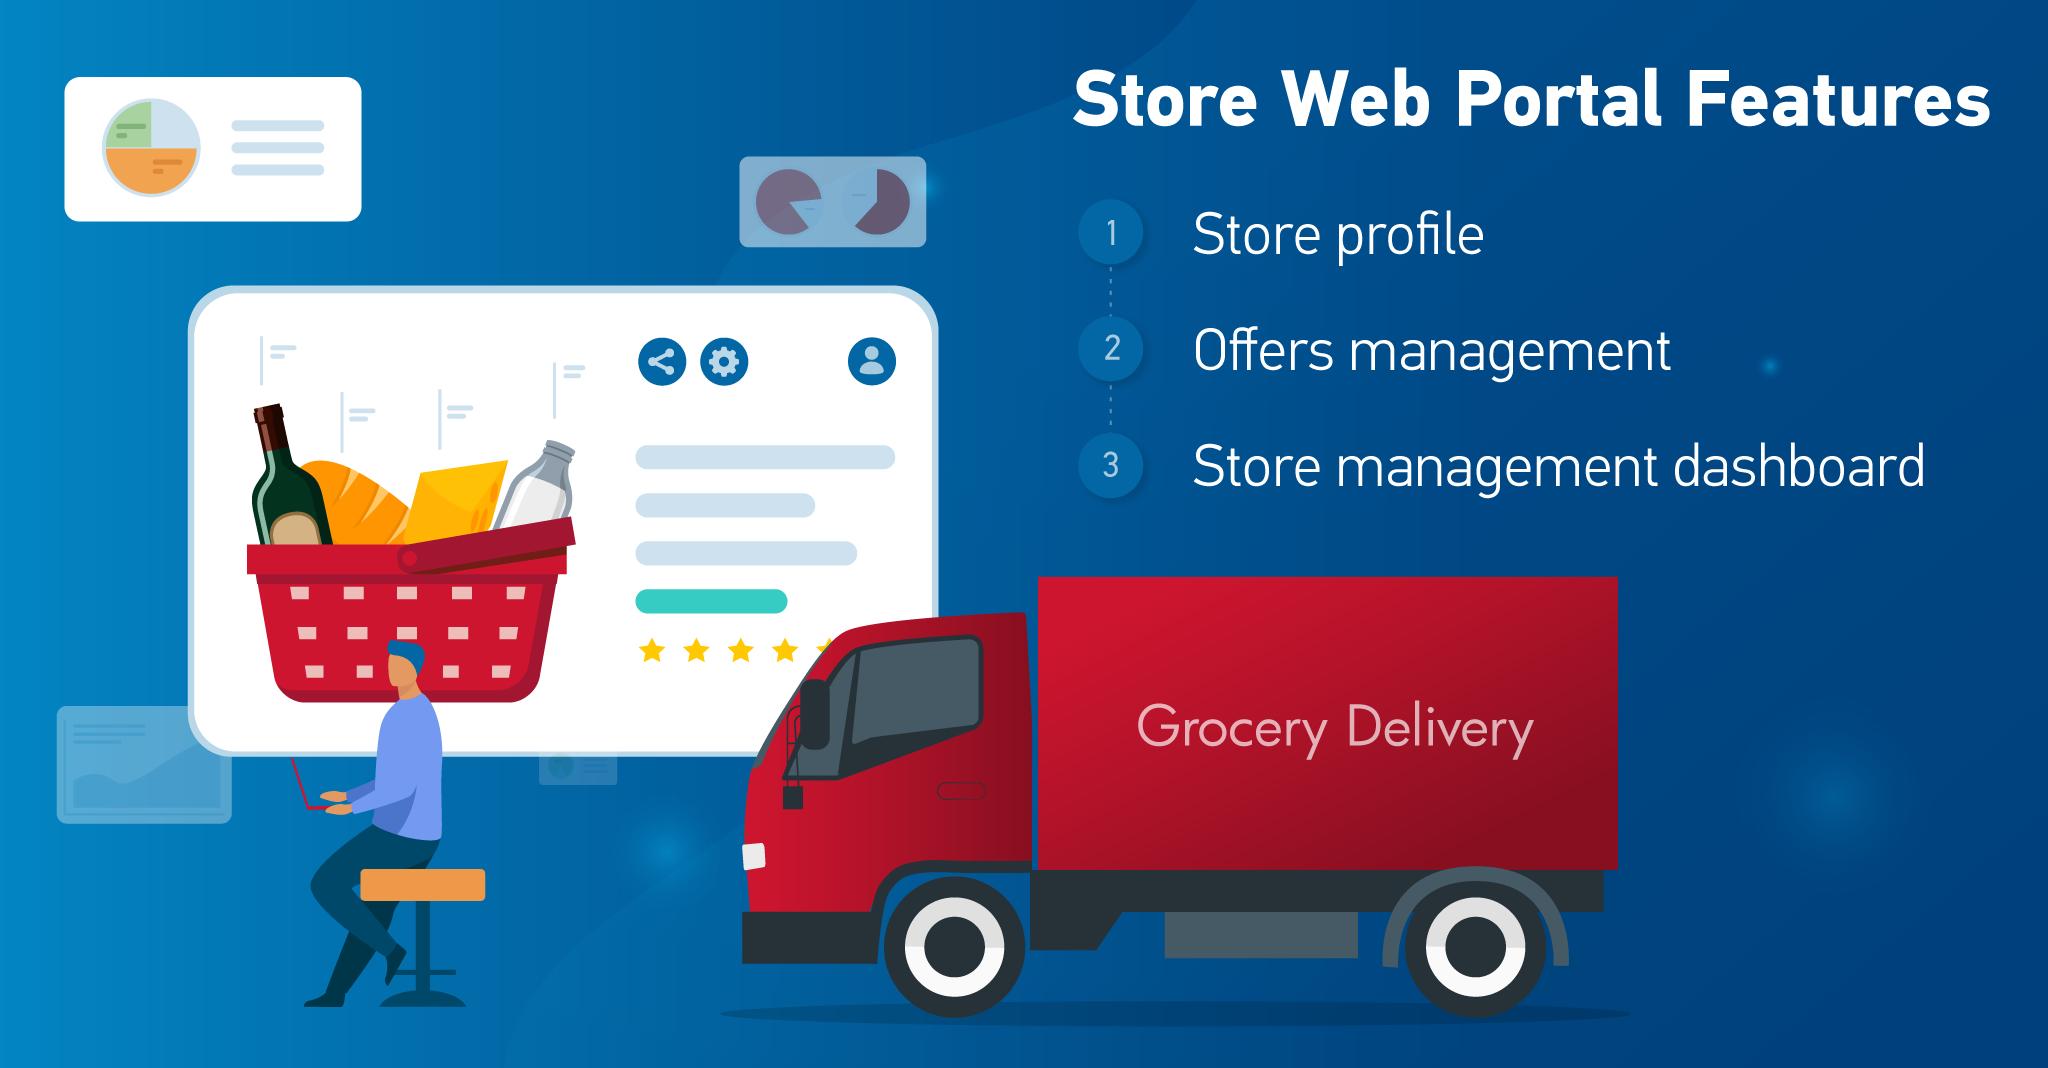 Store web portal features